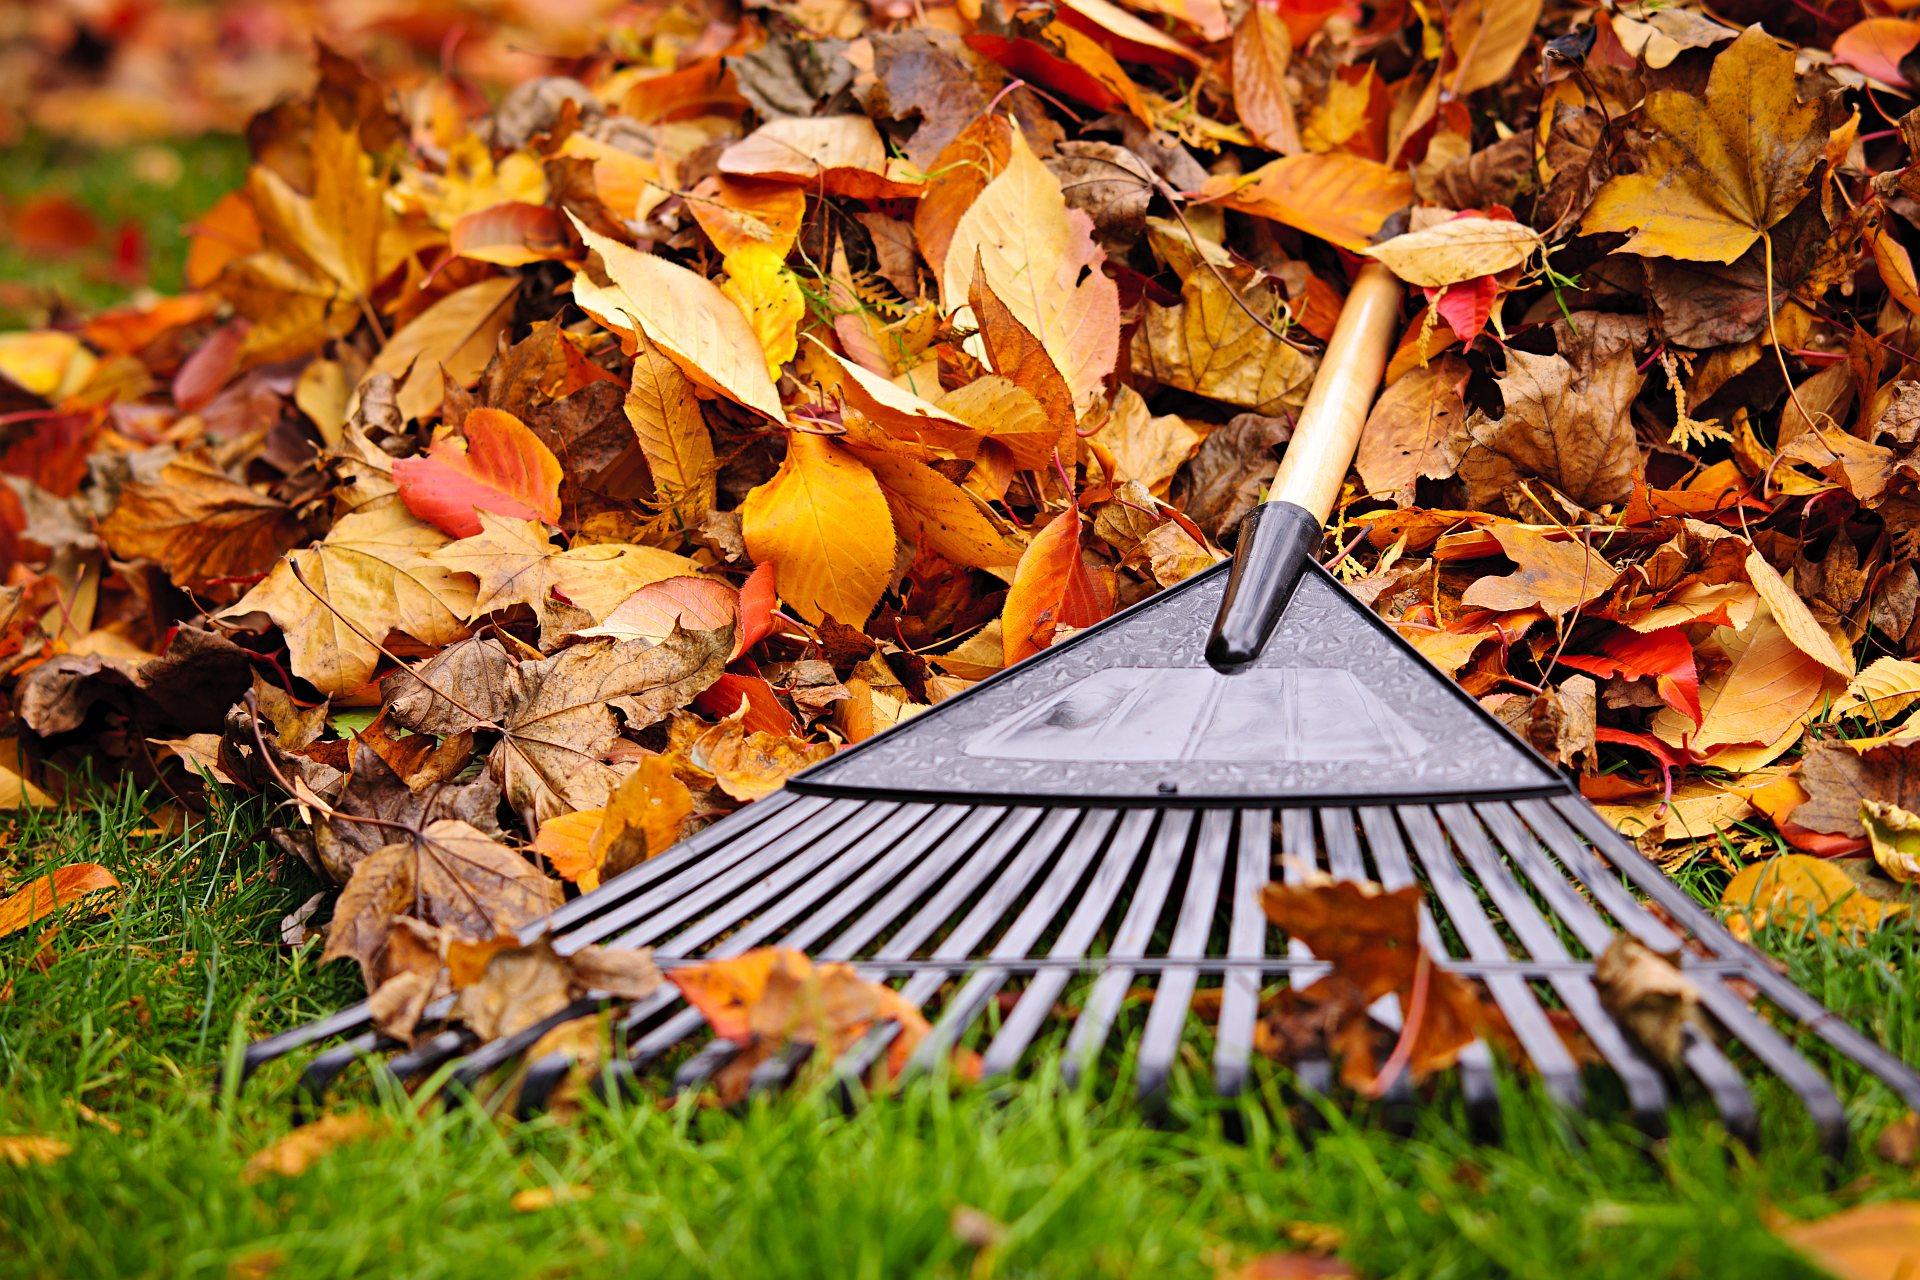 Seth_Maurer_Landscaping_Spring_Fall_Cleanup_1920px